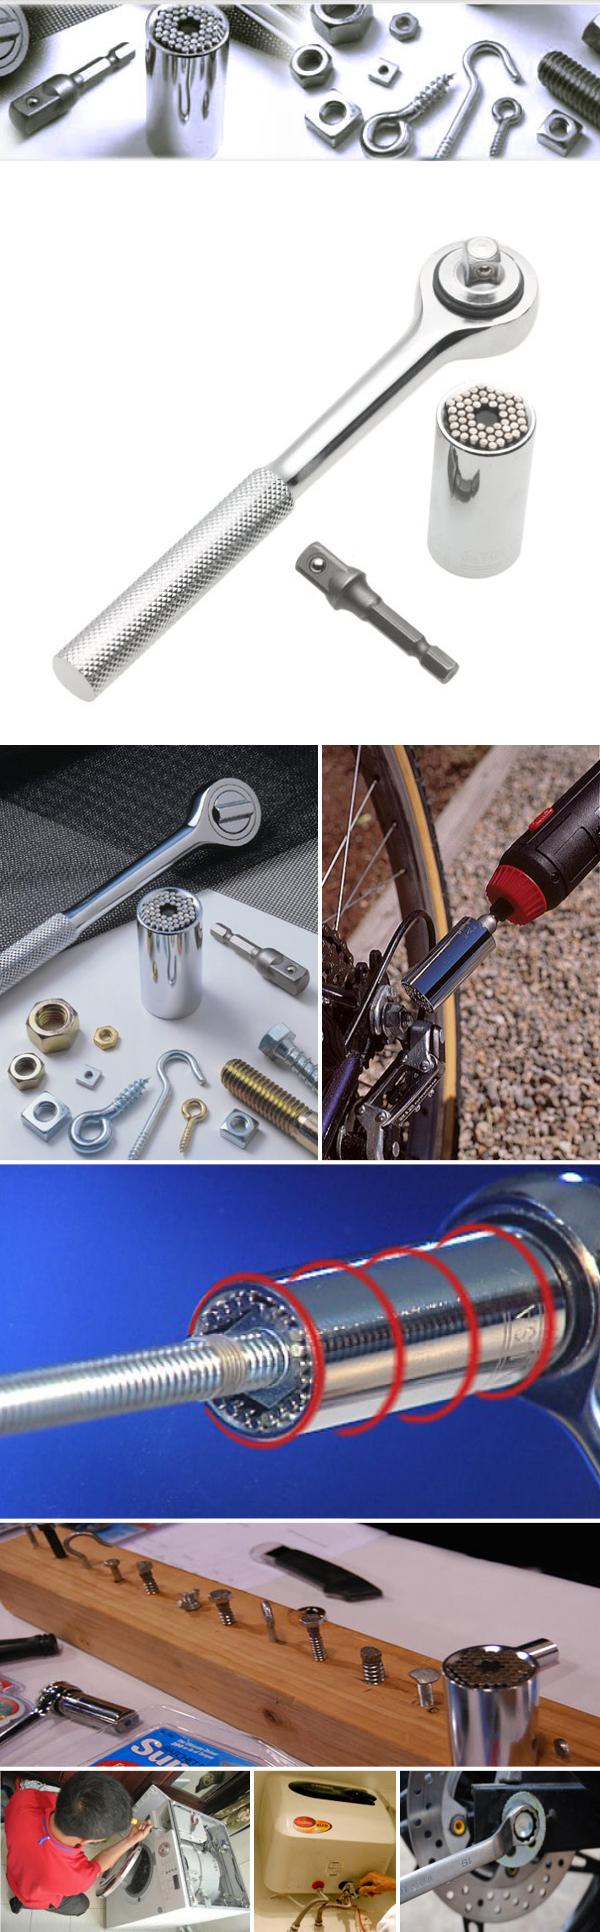 3pcs Set Magic Gator Grip Chrome Universal Multi-function Socket 7-19mm Ratchet Wrench Tool